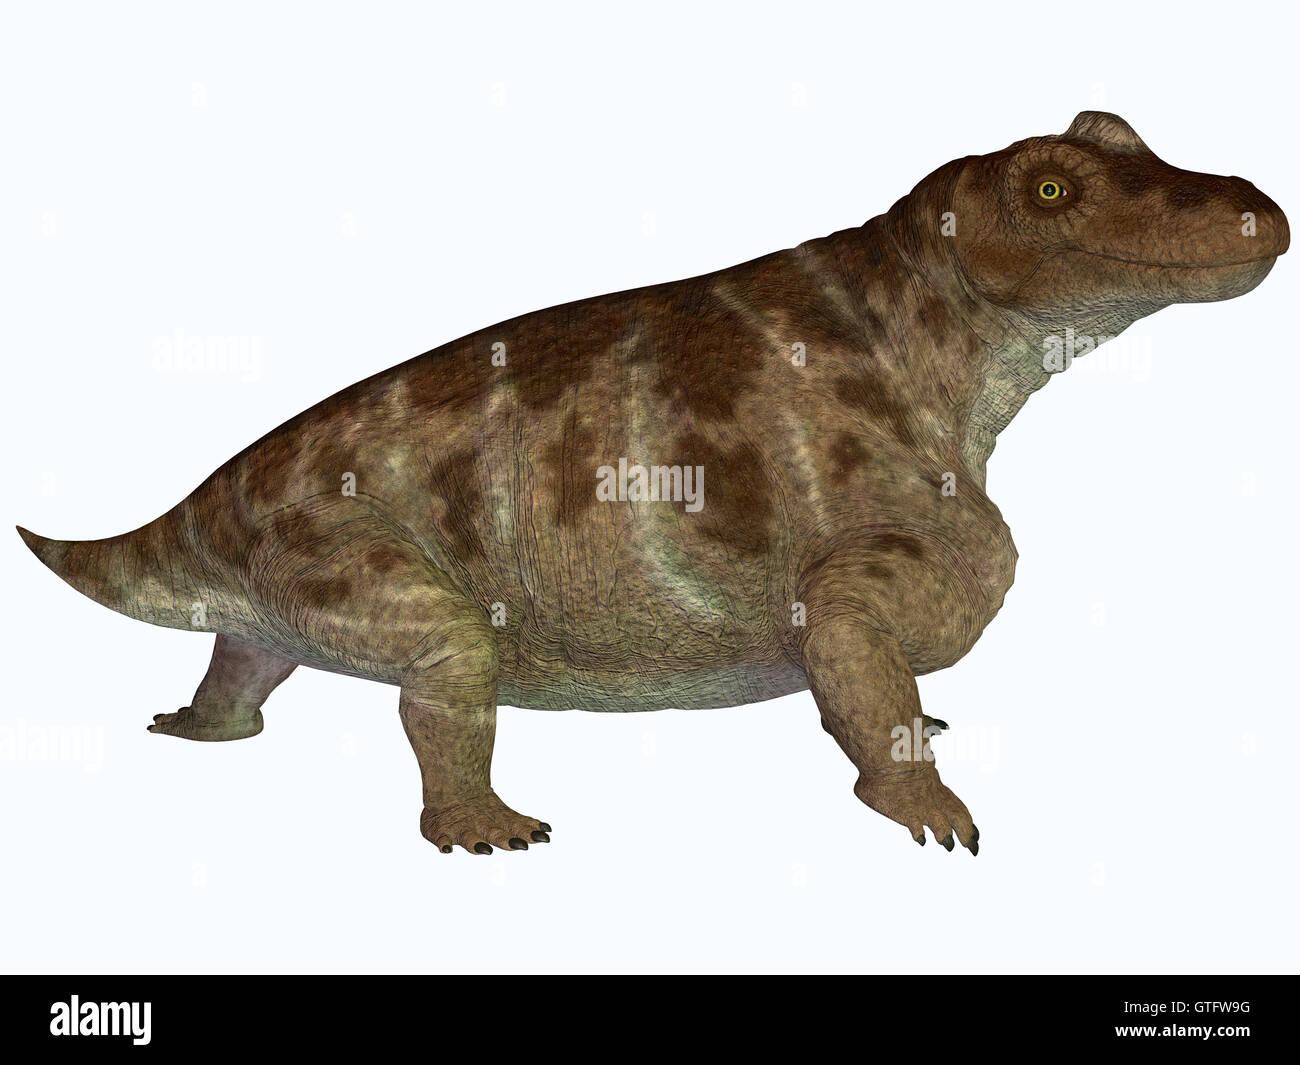 Keratocephalus on White - Stock Image